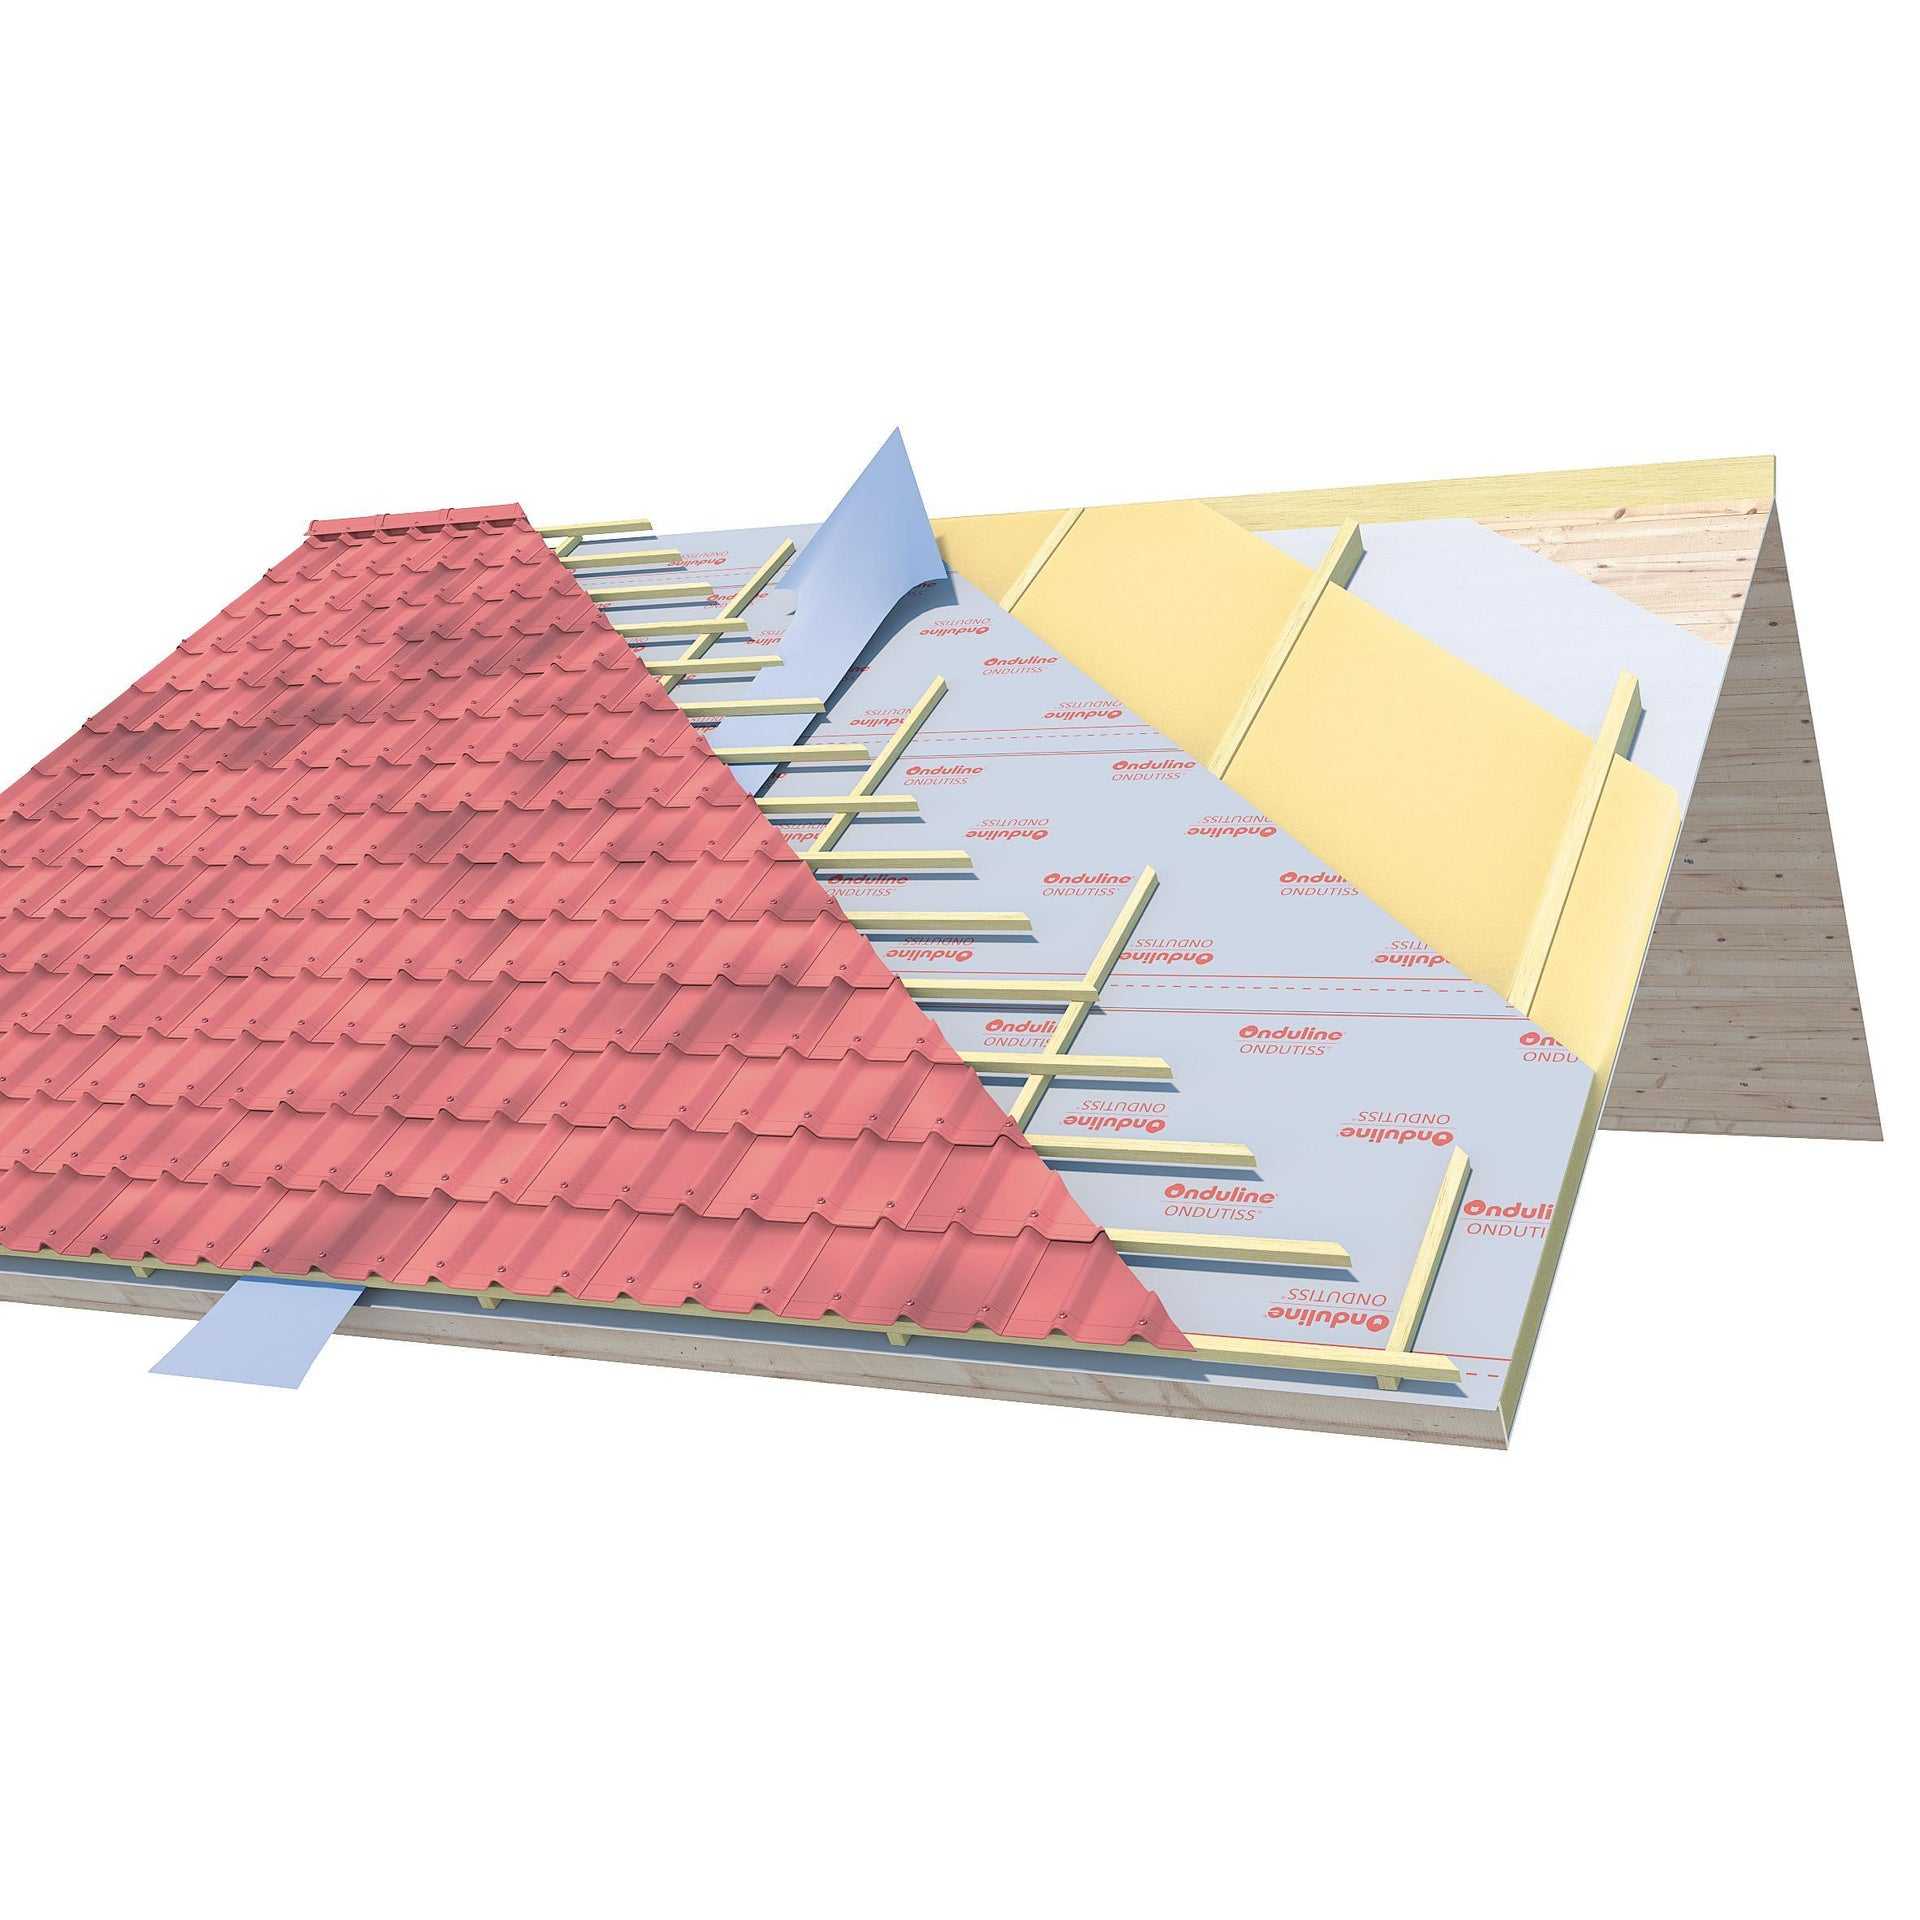 Membrana bituminosa ONDULINE Ondutiss air 170 170 g/m³ 1.5 x 50 m trasparente - 2